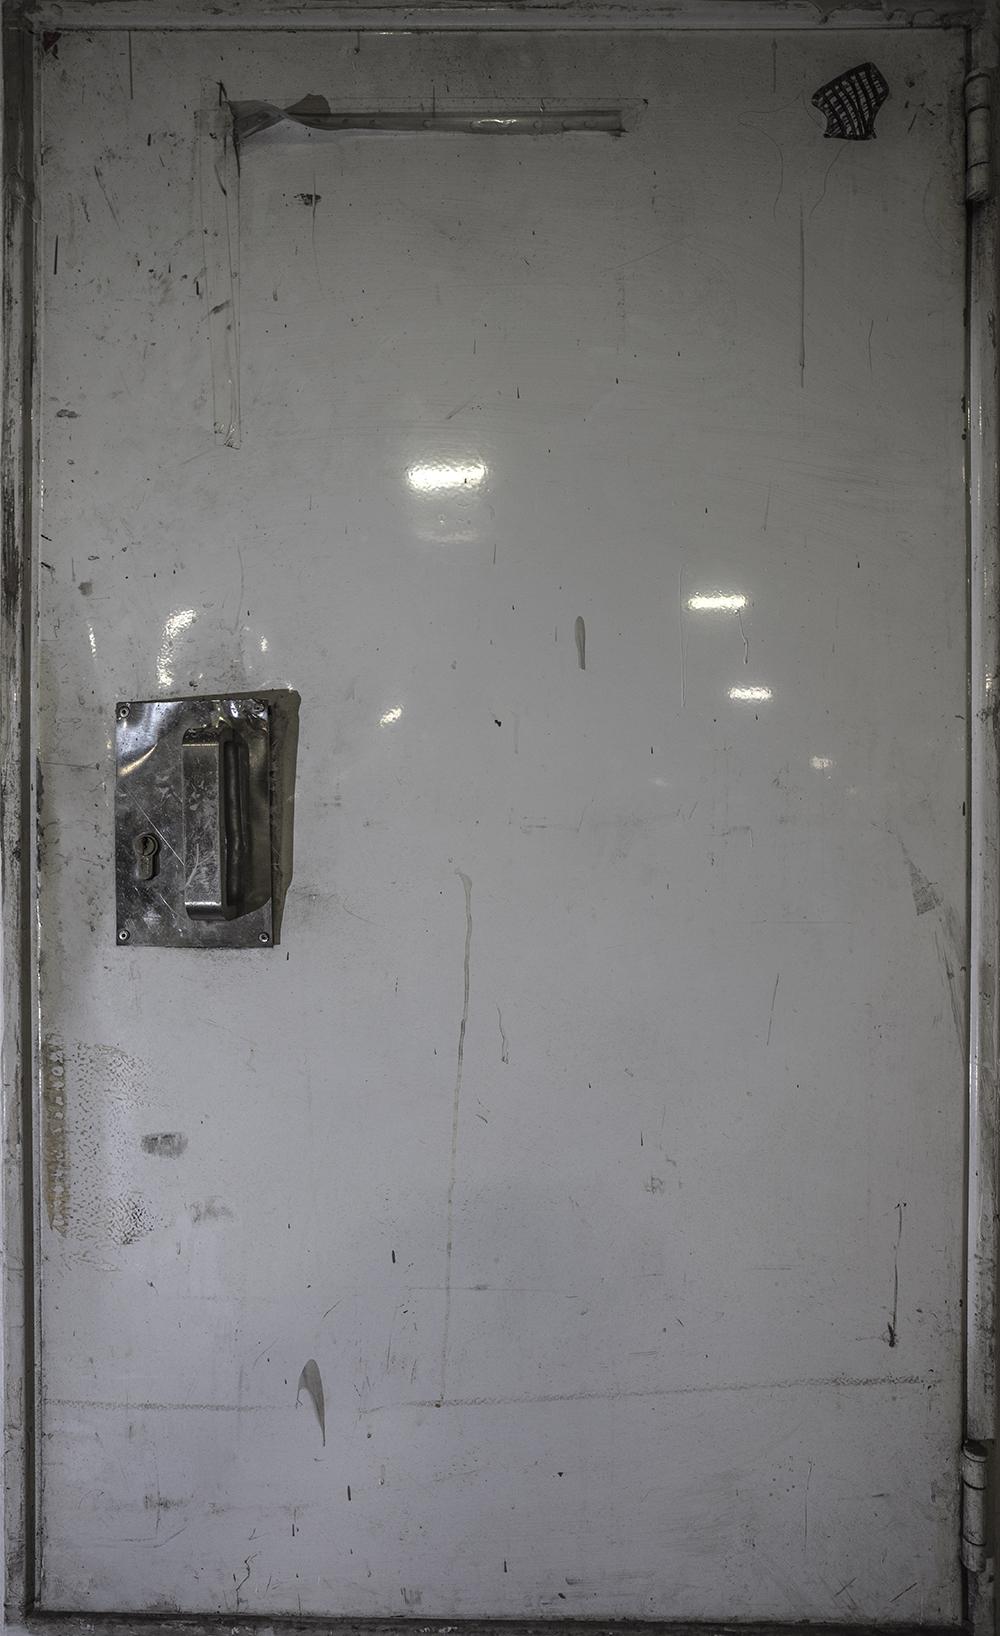 puerta chica. luis_re. luis_guillermo_ramirez_ezquerra